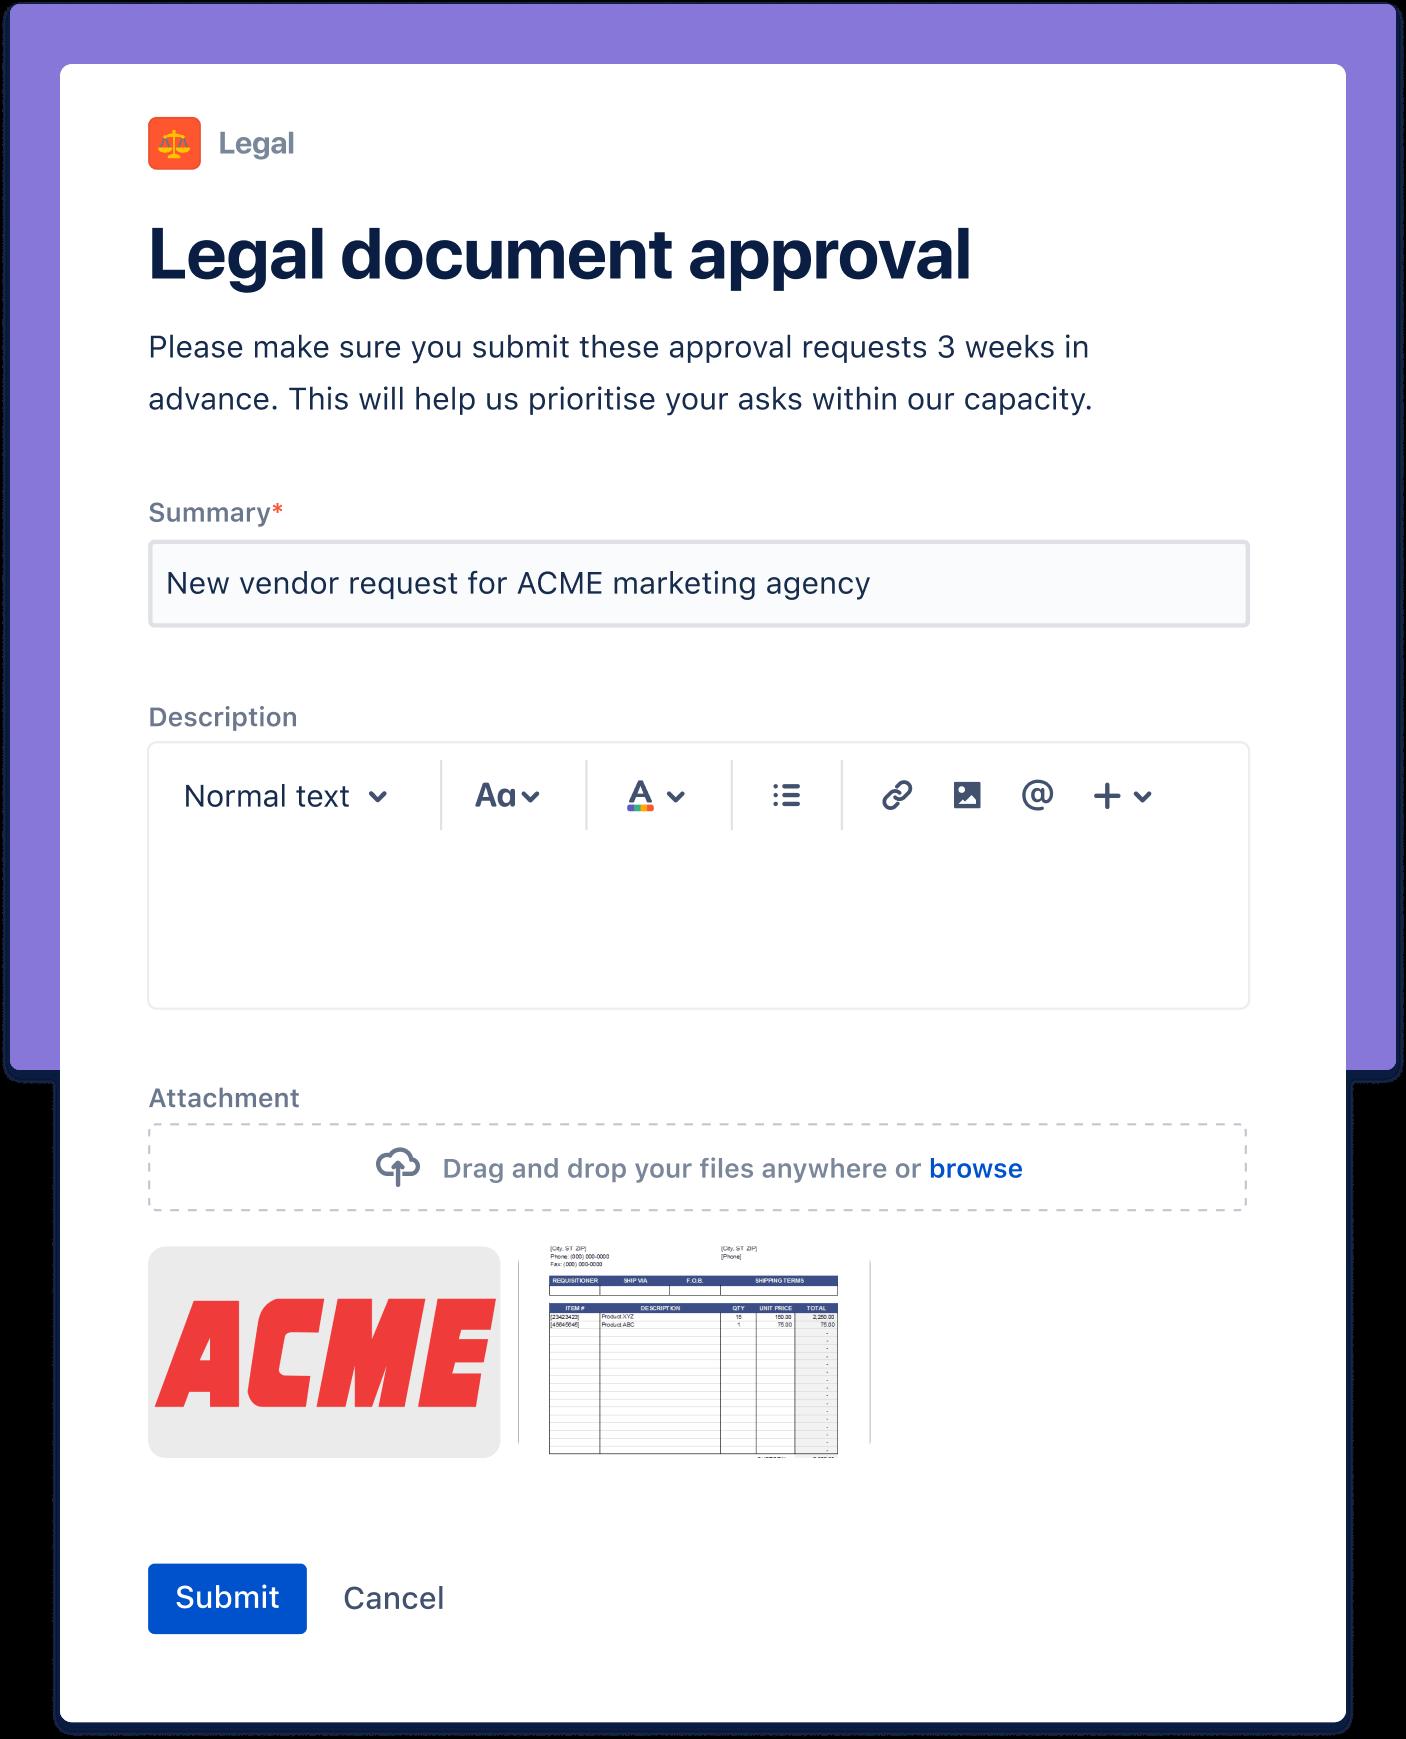 Screenshot di approvazione documento legale